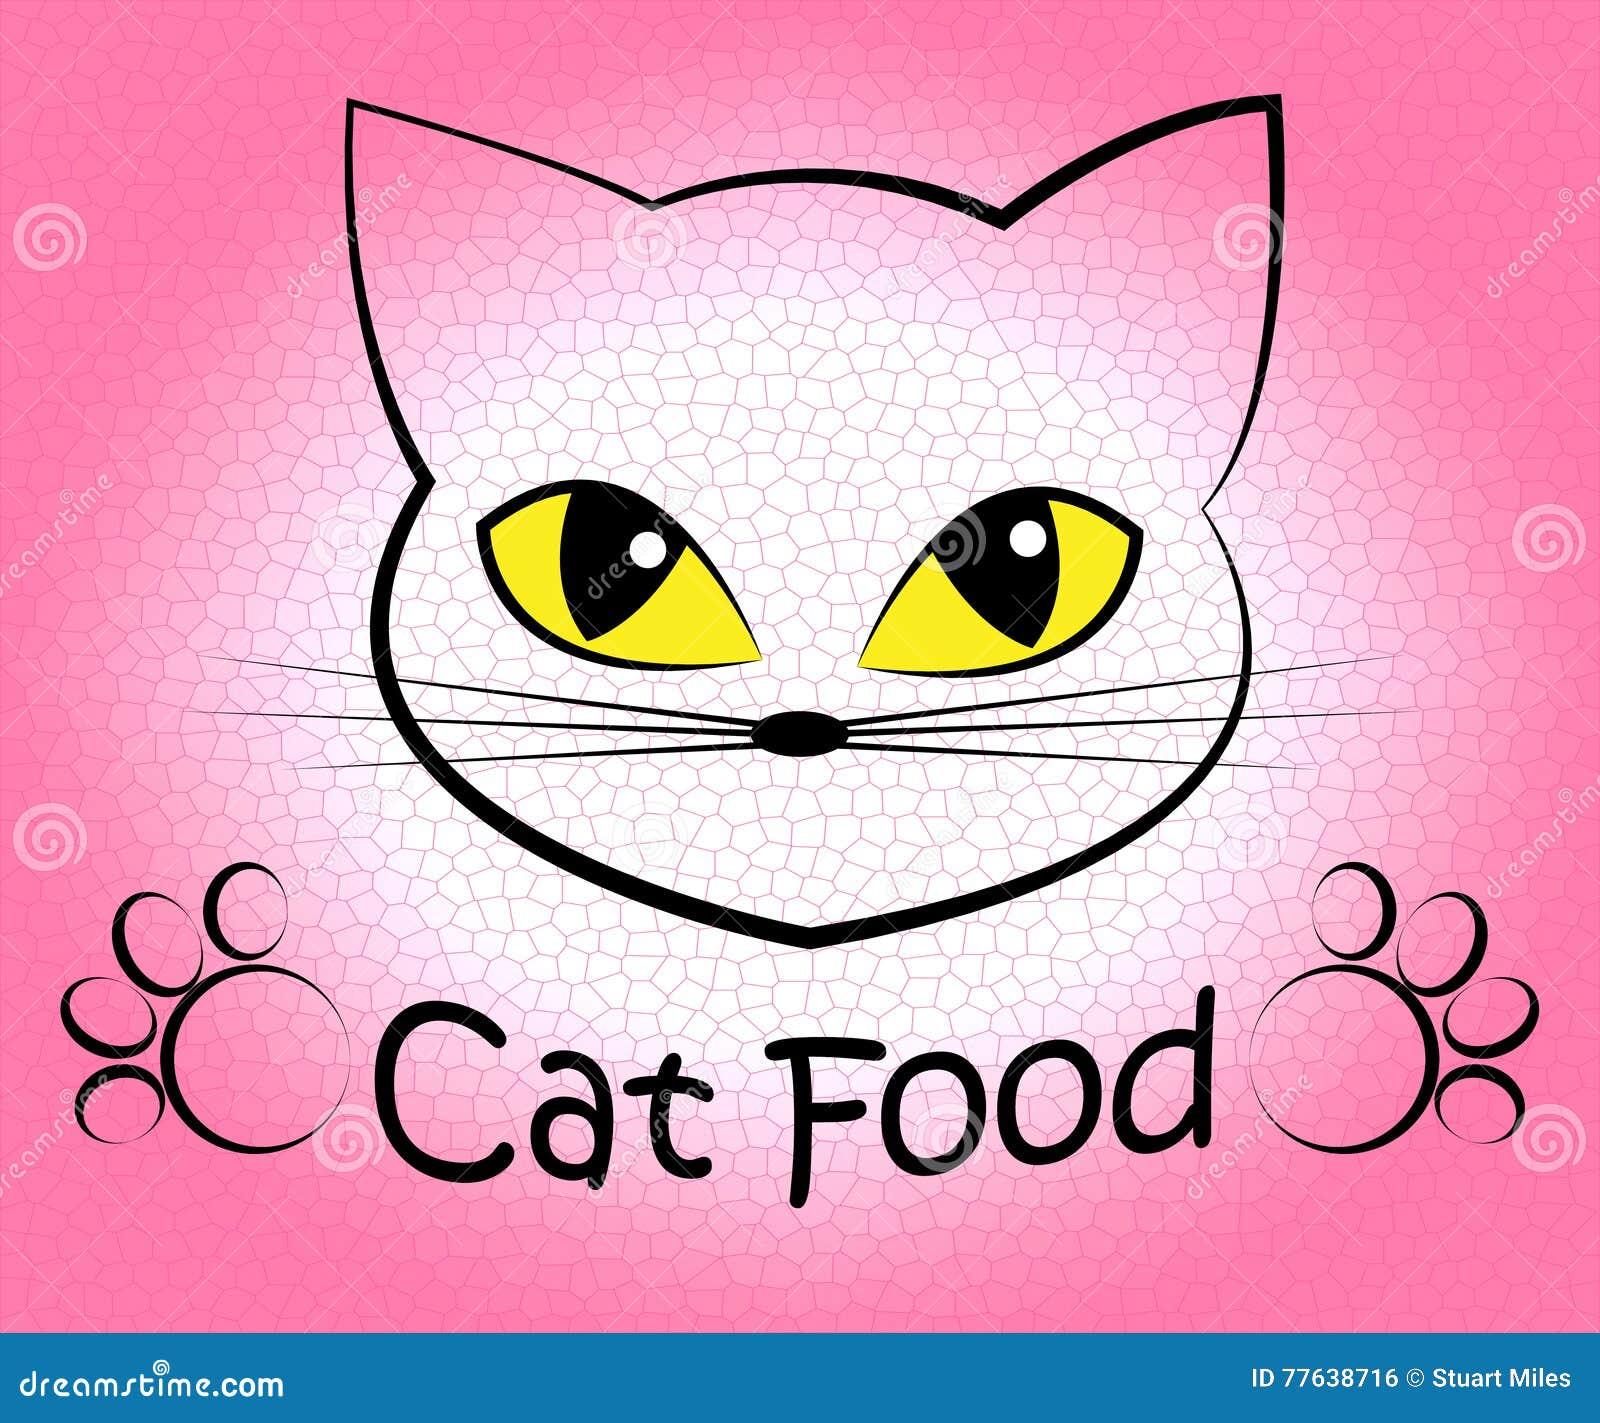 Cat Food Indicates Feline Eating y cocina